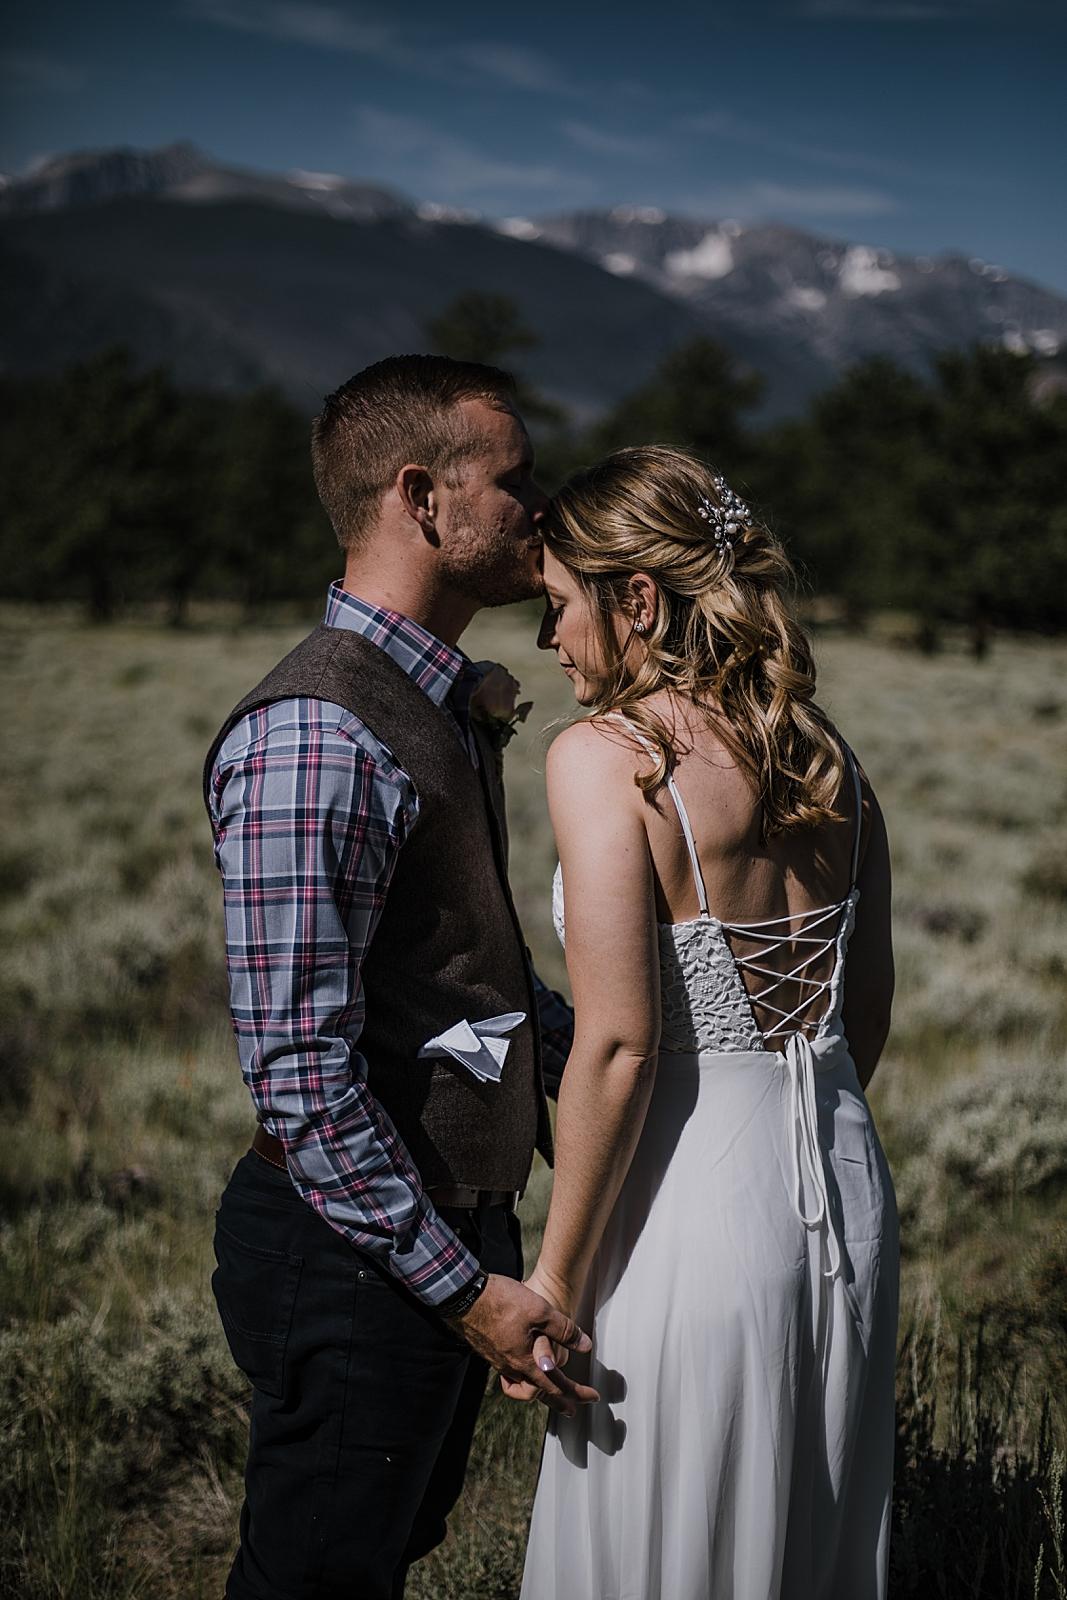 park ranger and bride, RMNP elopement ceremony, rocky mountain national park elopement, 3M curves elopement, self solemnizing, self solemnization, long's peak, summer elopement, estes park elopement